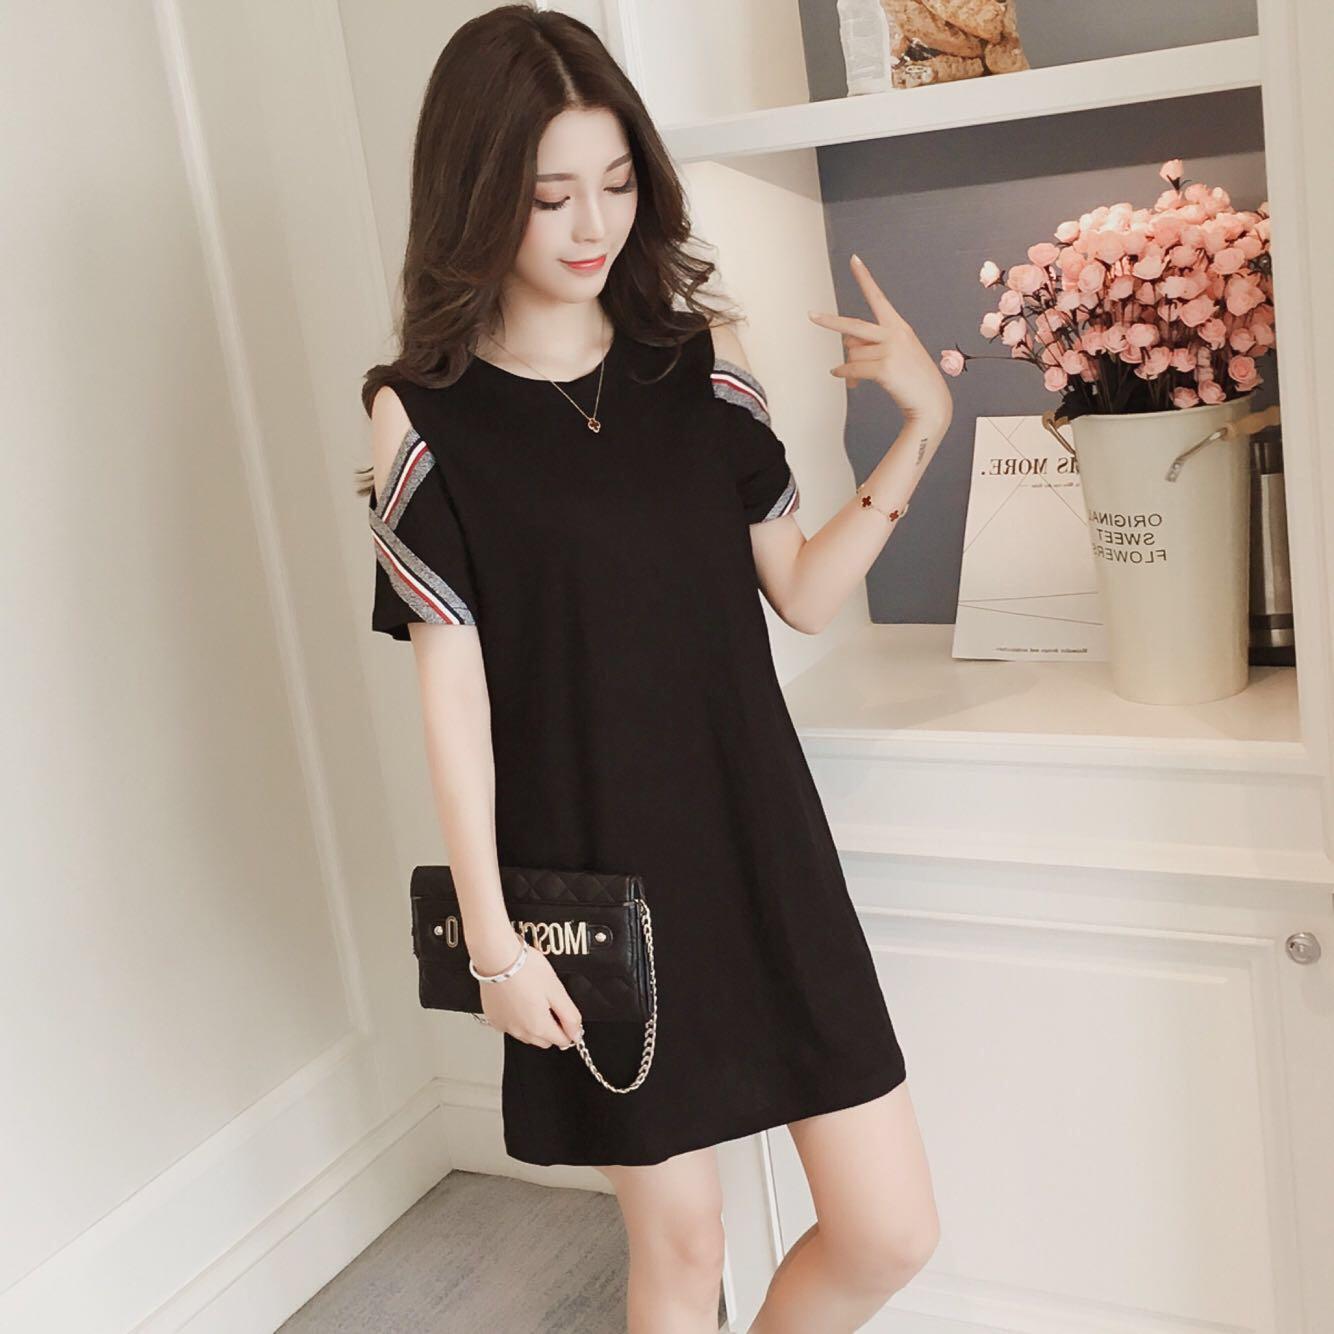 Black Coloured Stripes Trim Crossed Sleeves Korean Style Dress Women S Fashion Clothes Dresses Skirts On Carou